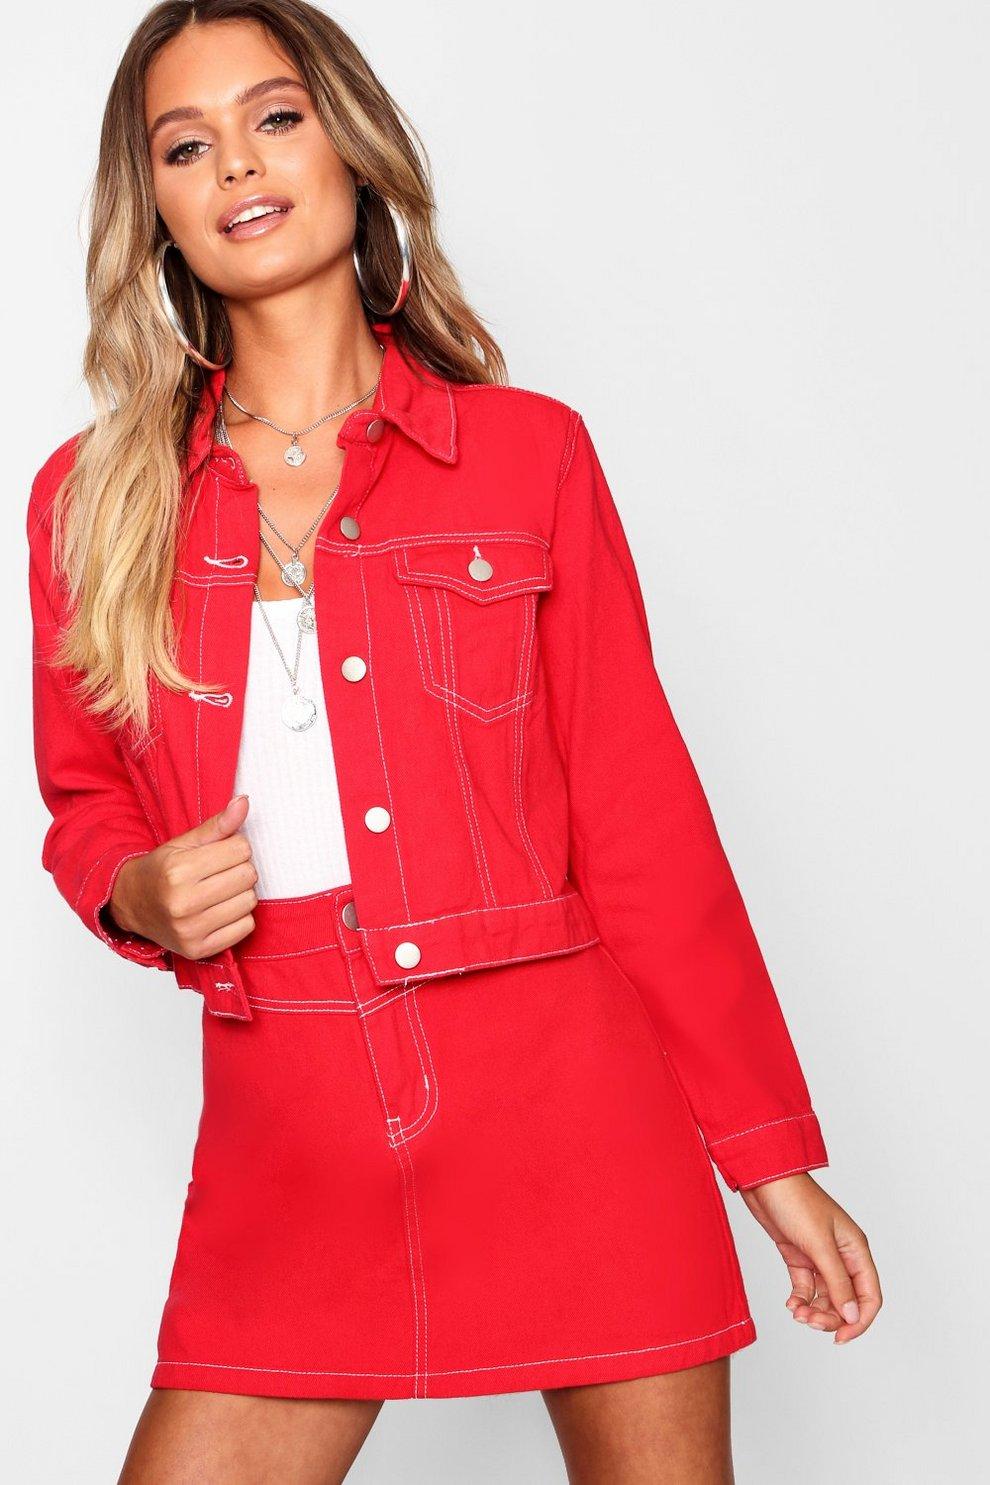 cb08ddd43d097 Red Contrast Stitch Cropped Denim Trucker Jacket | Boohoo